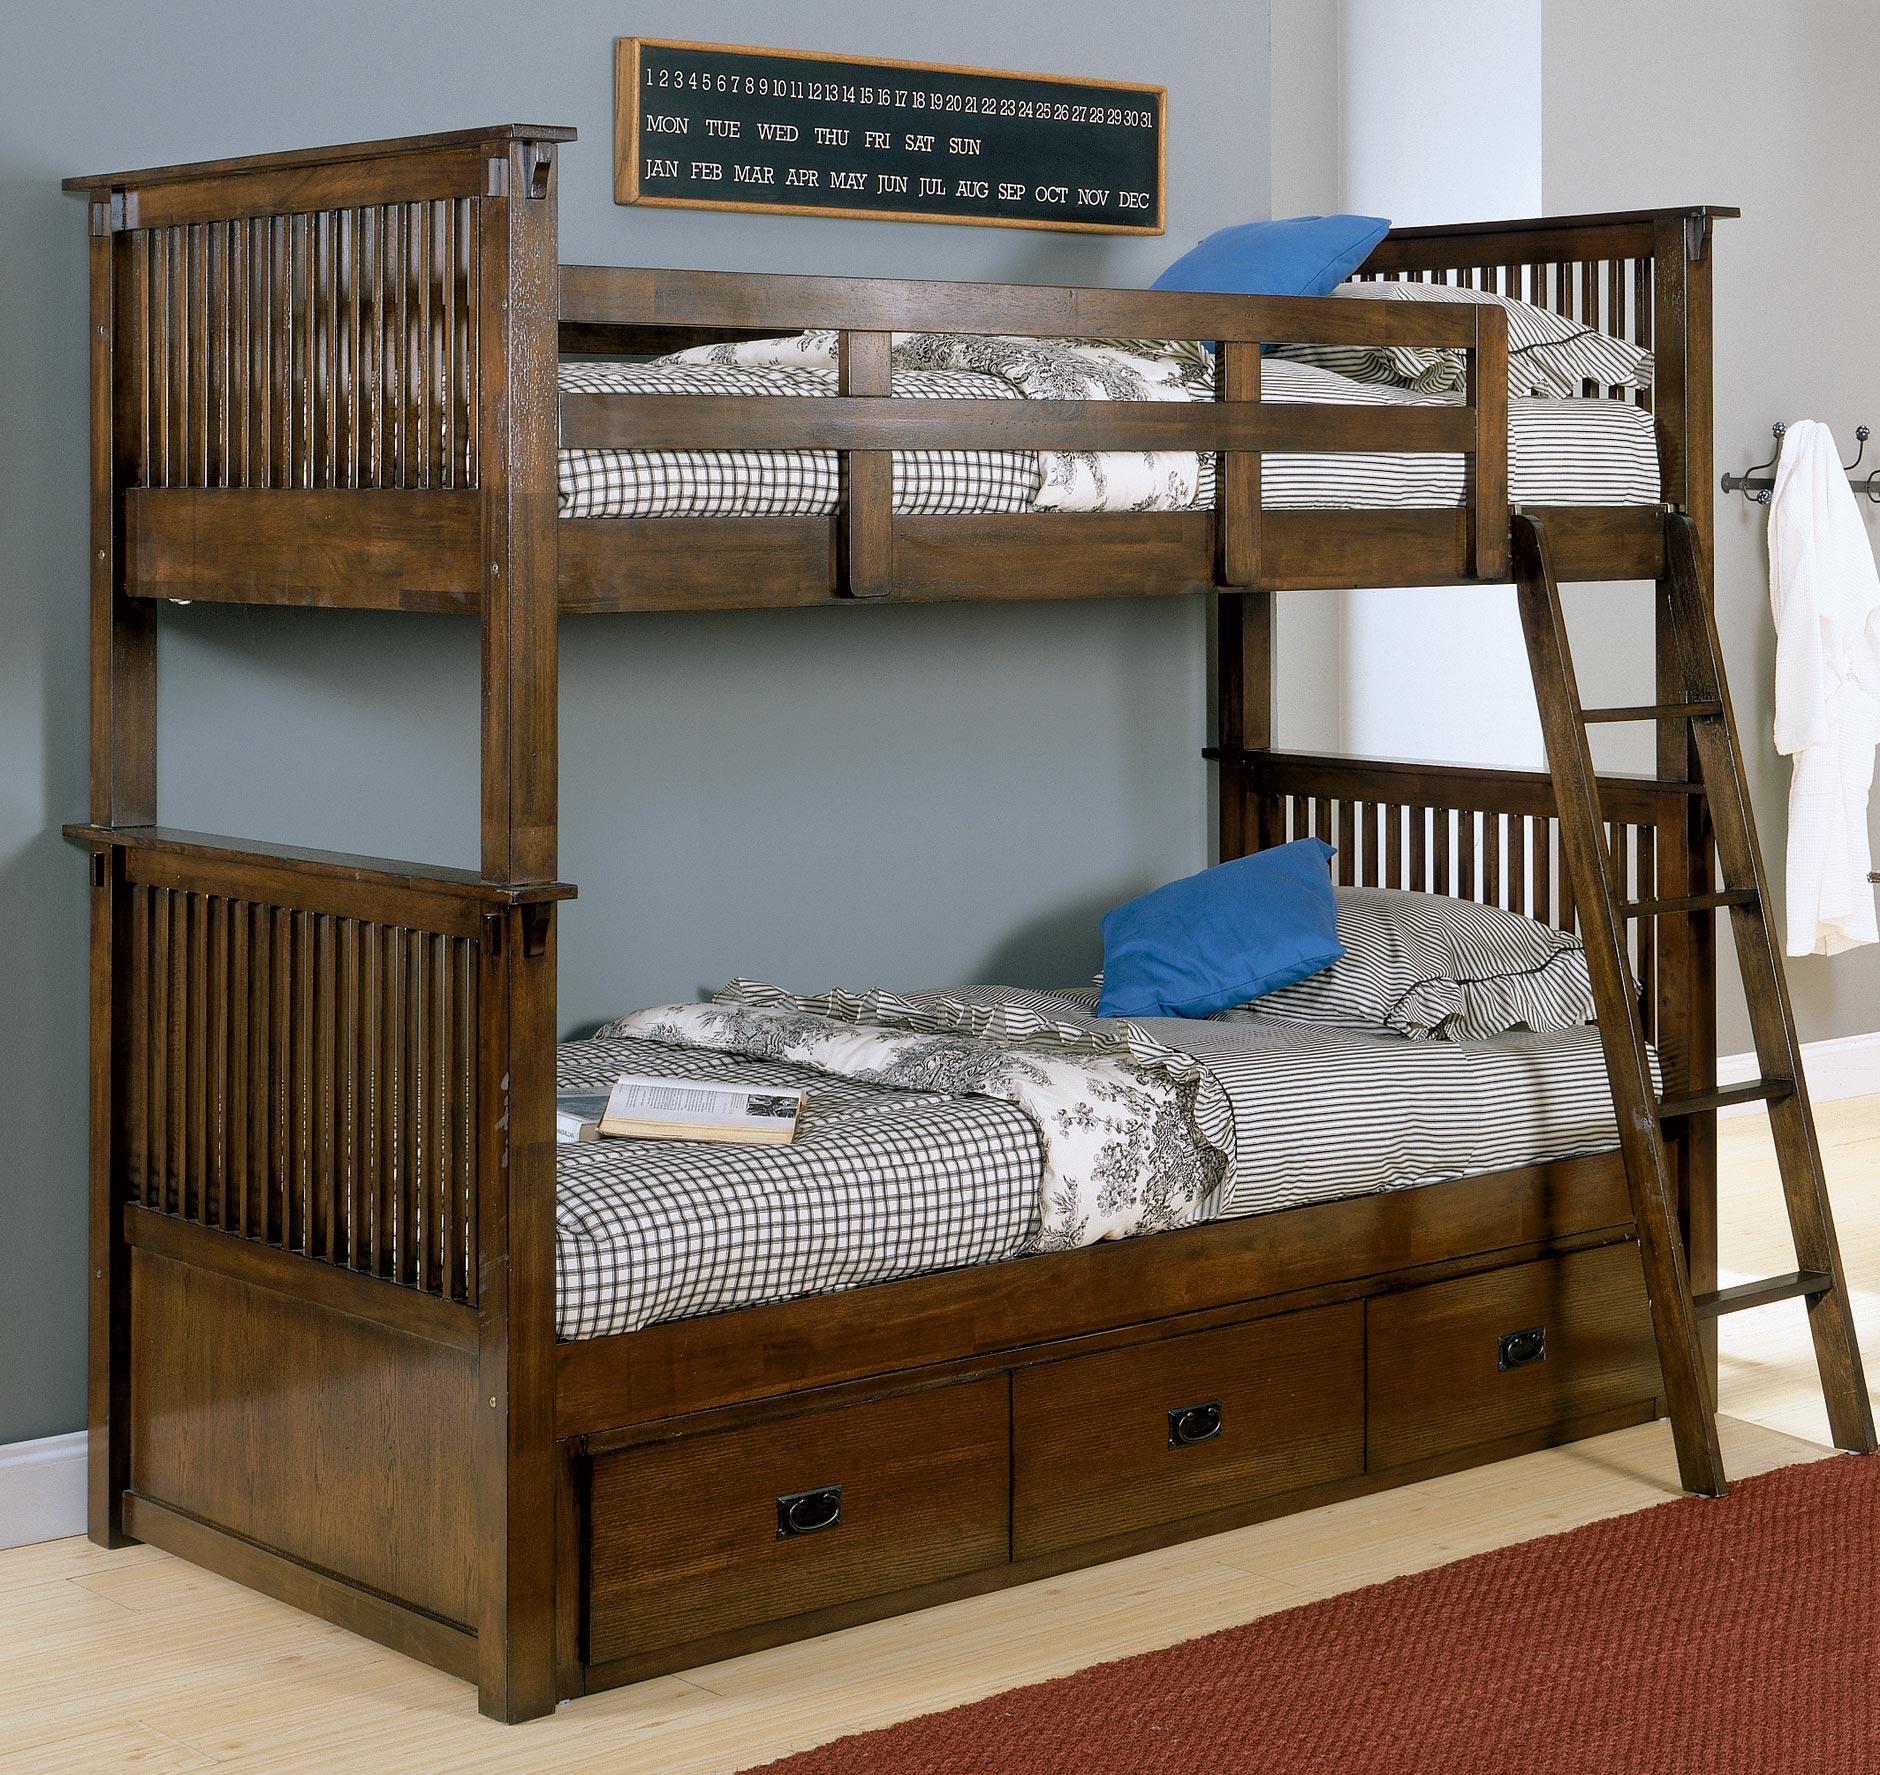 homelegance santee bunk bed with matress support system. Black Bedroom Furniture Sets. Home Design Ideas